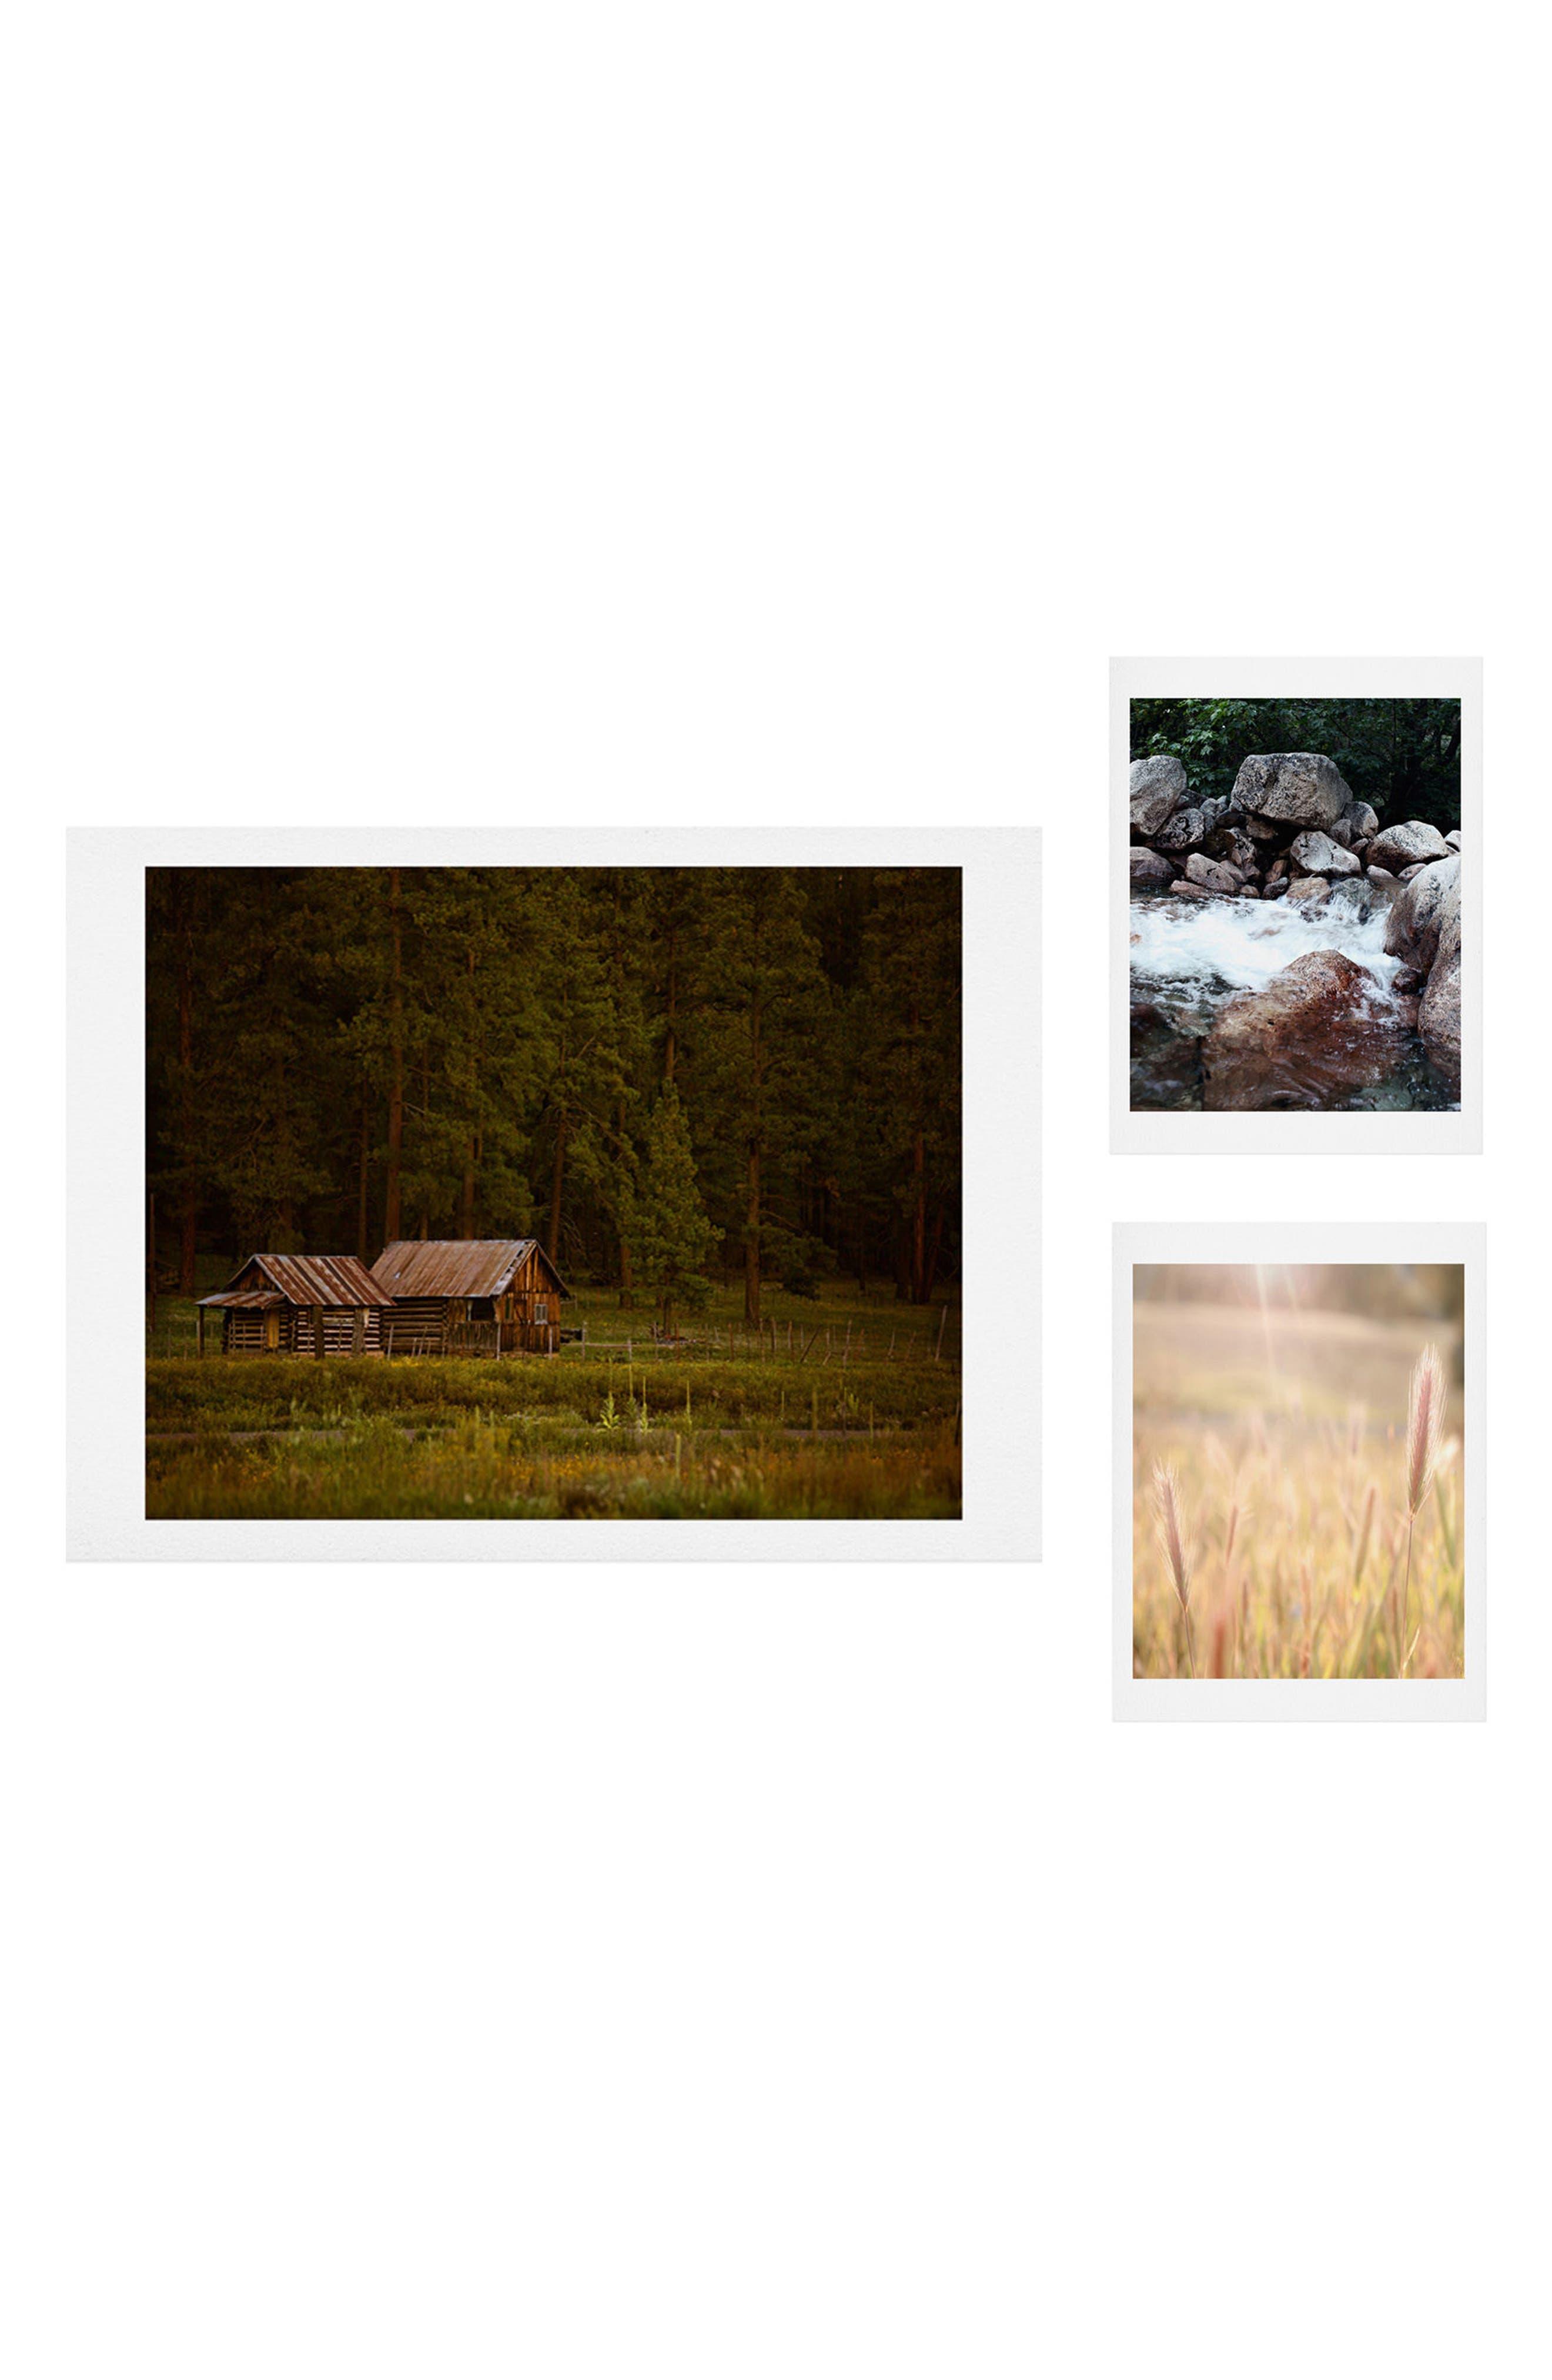 Main Image - Deny Designs Waves Peaceful Ranch Gallery Wall Art Print Set